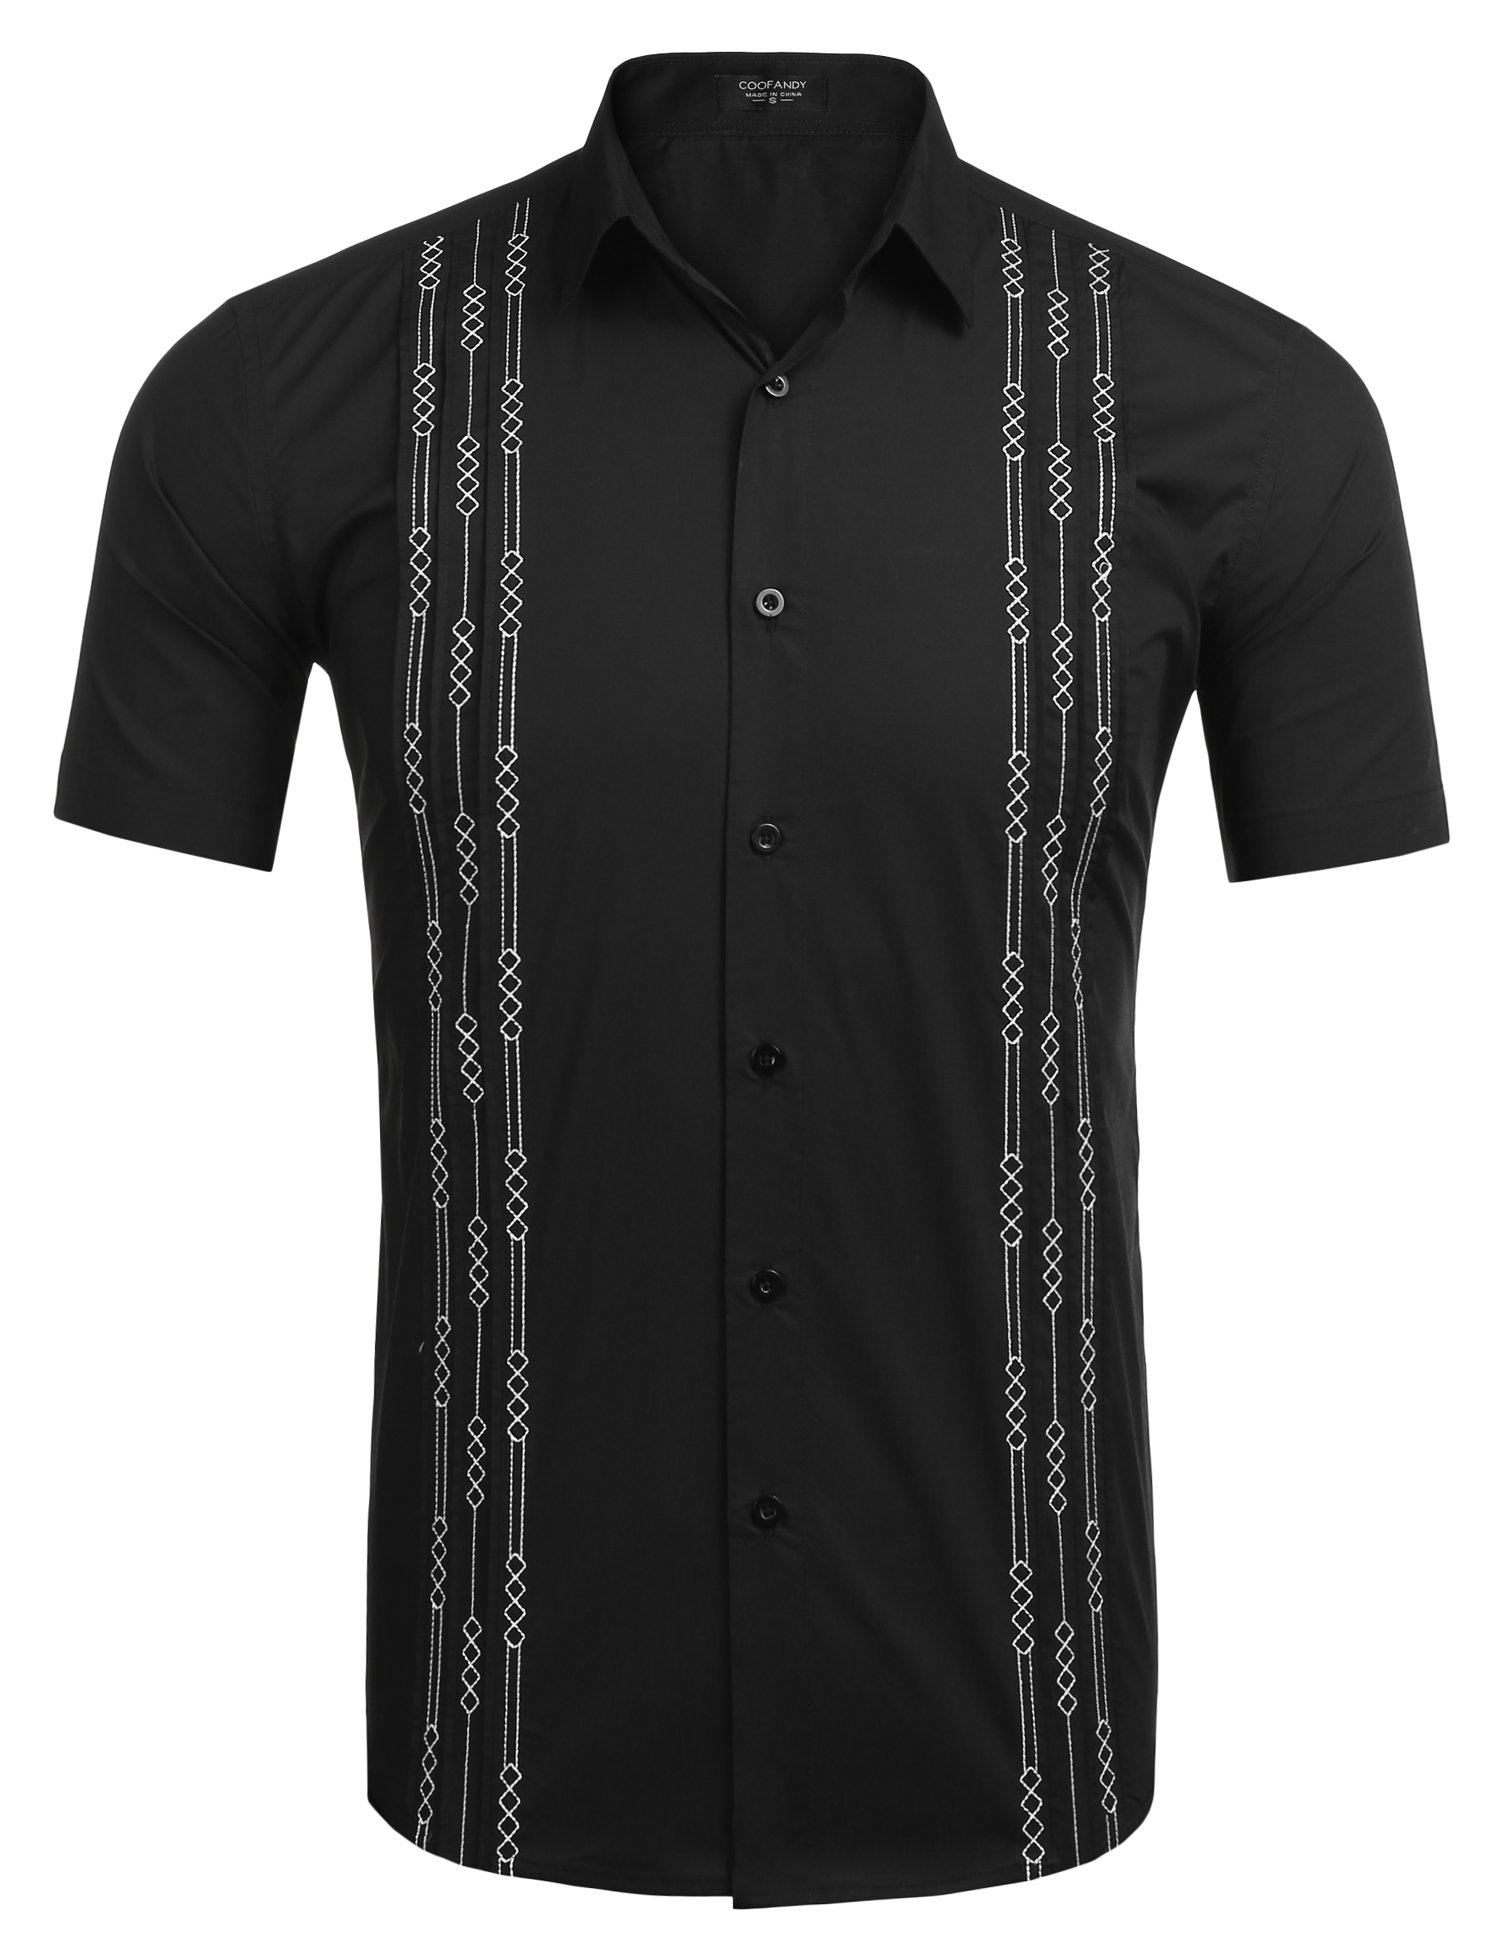 COOFANDY Mens Short Sleeve Guayabera Cuban Shirt Wedding Party Beach Dress Shirt,Black,XX-Large